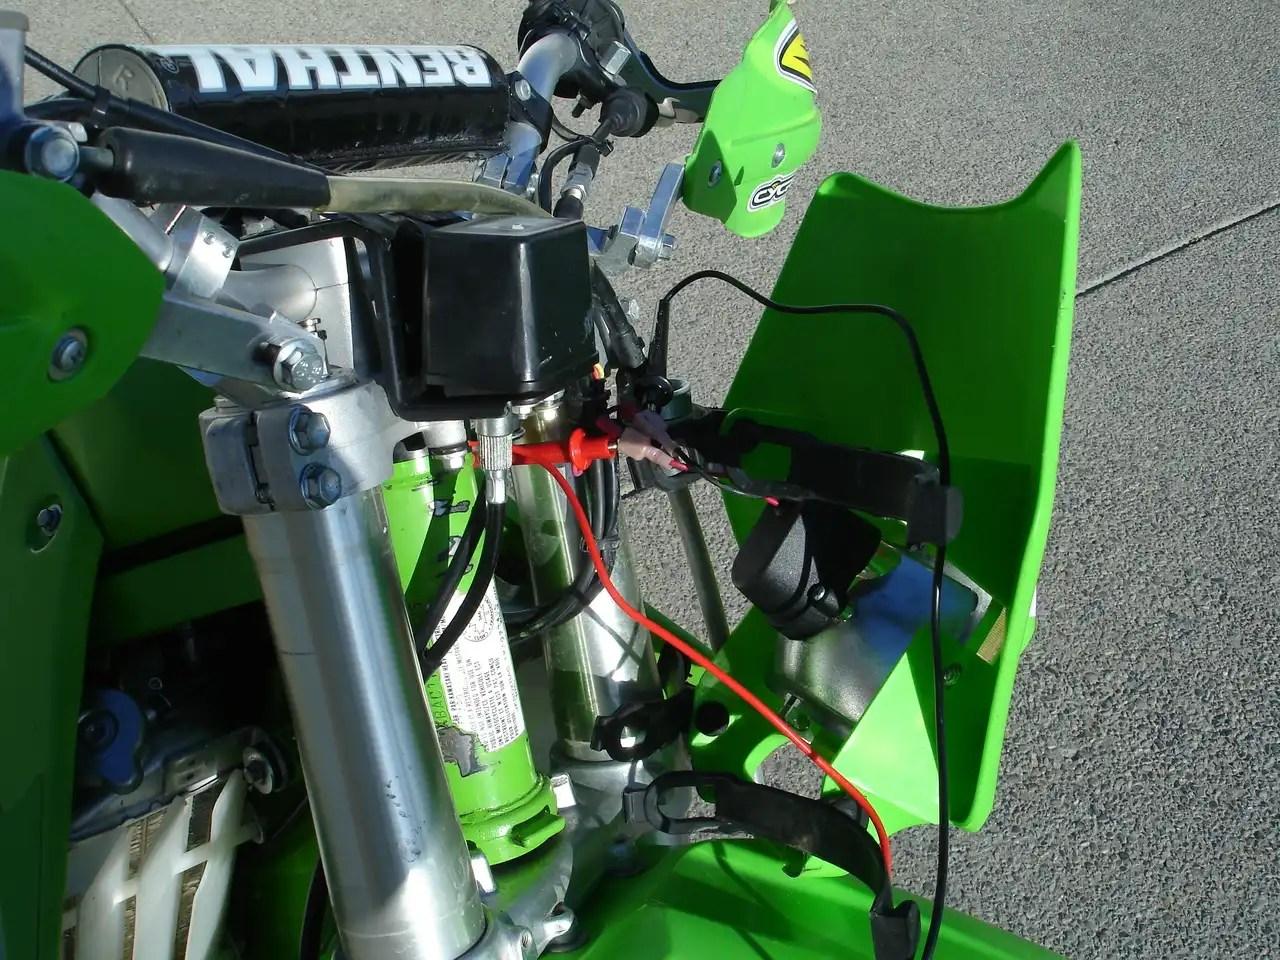 Gauge Wiring Diagram Together With Peterbilt Headlight Wiring Diagram